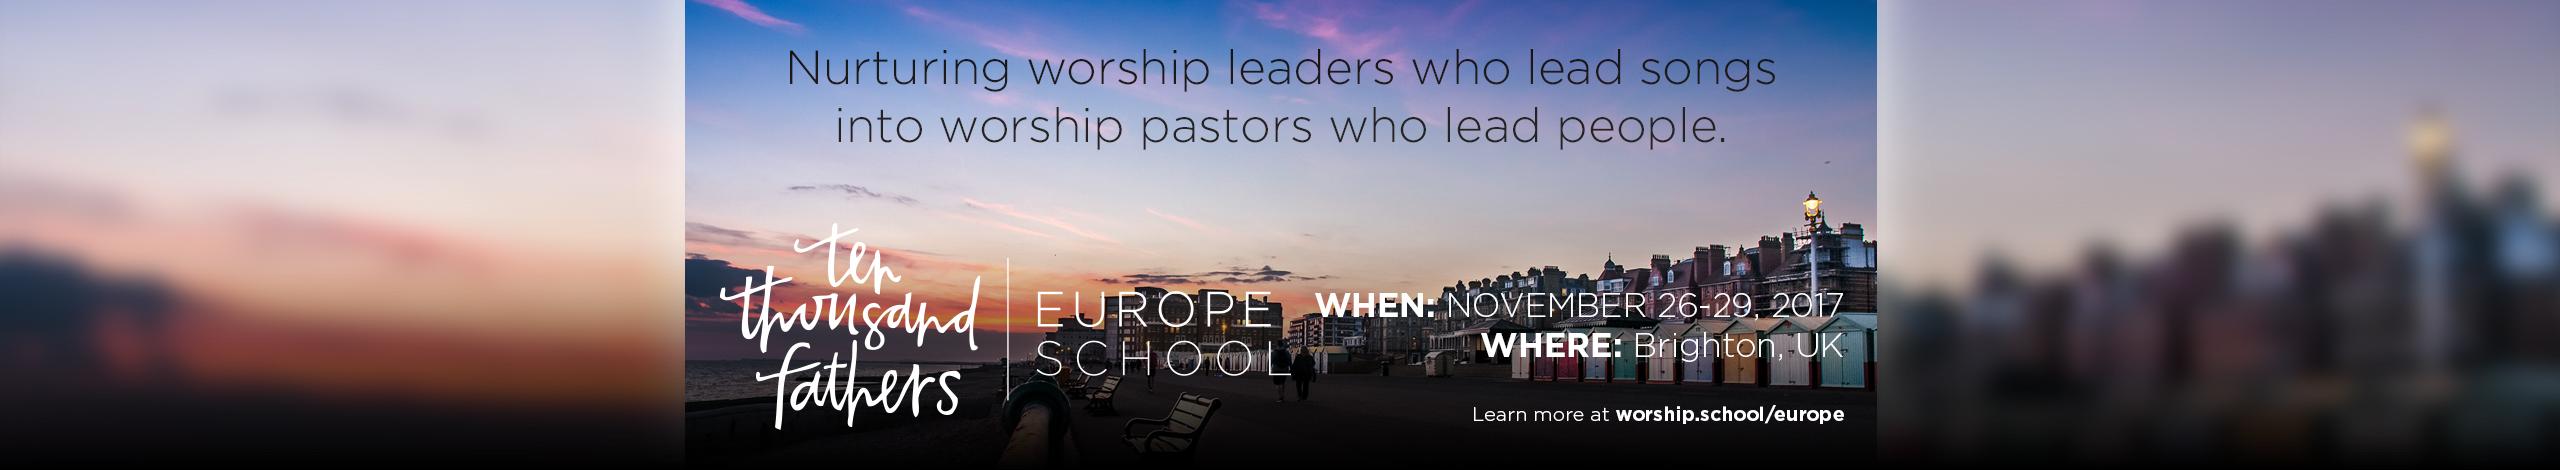 10000 Fathers school Europe